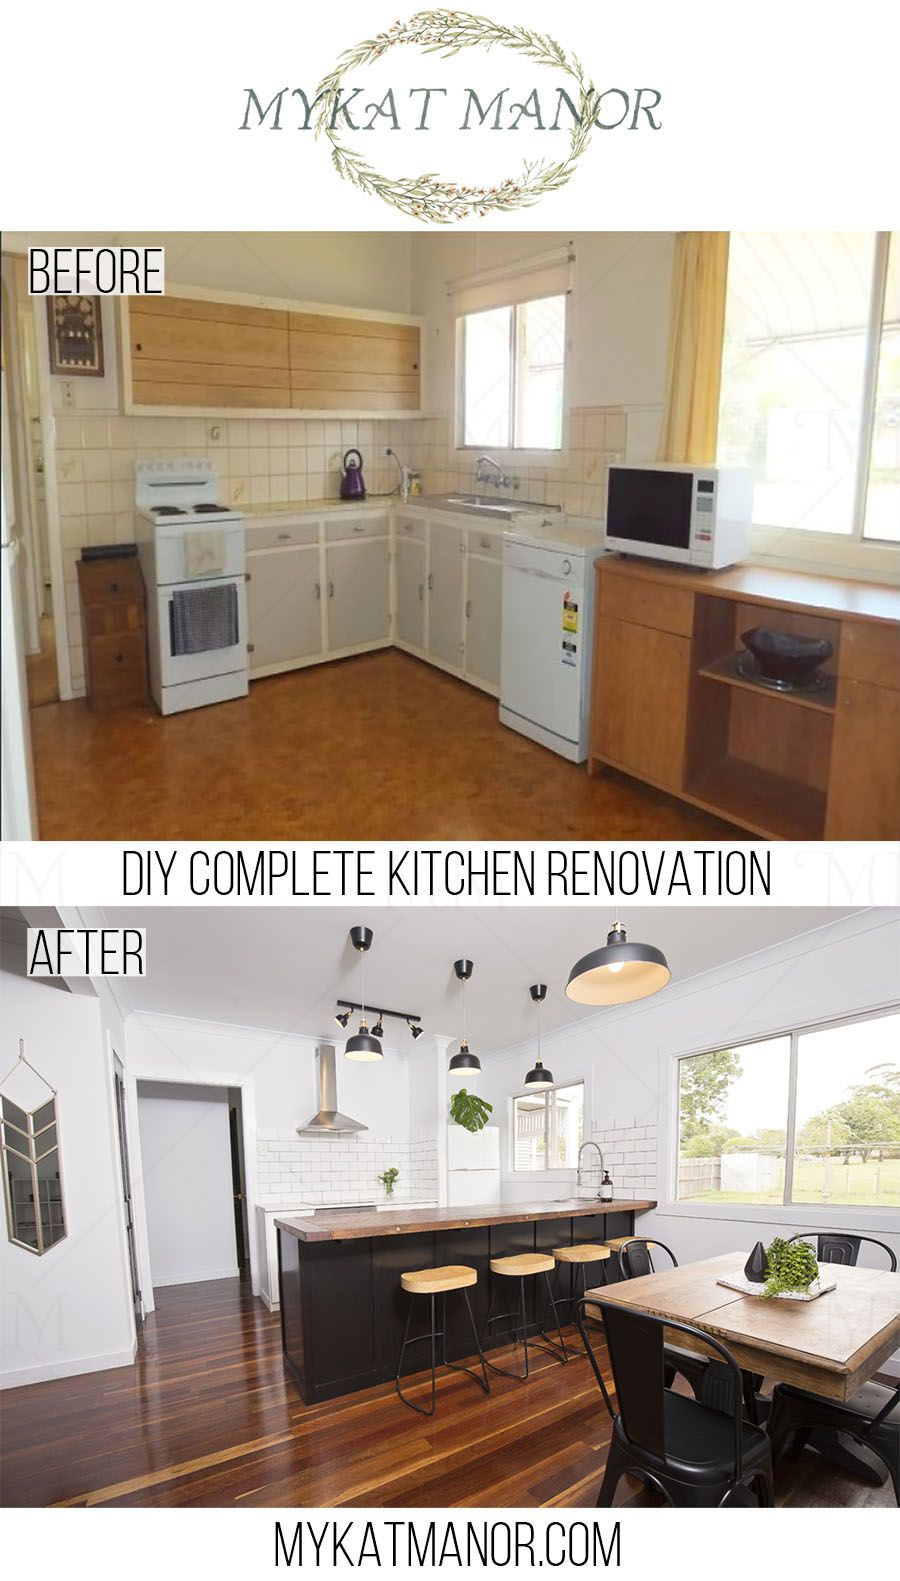 Diy Kitchen Renovation step by step guide. beforeandafter